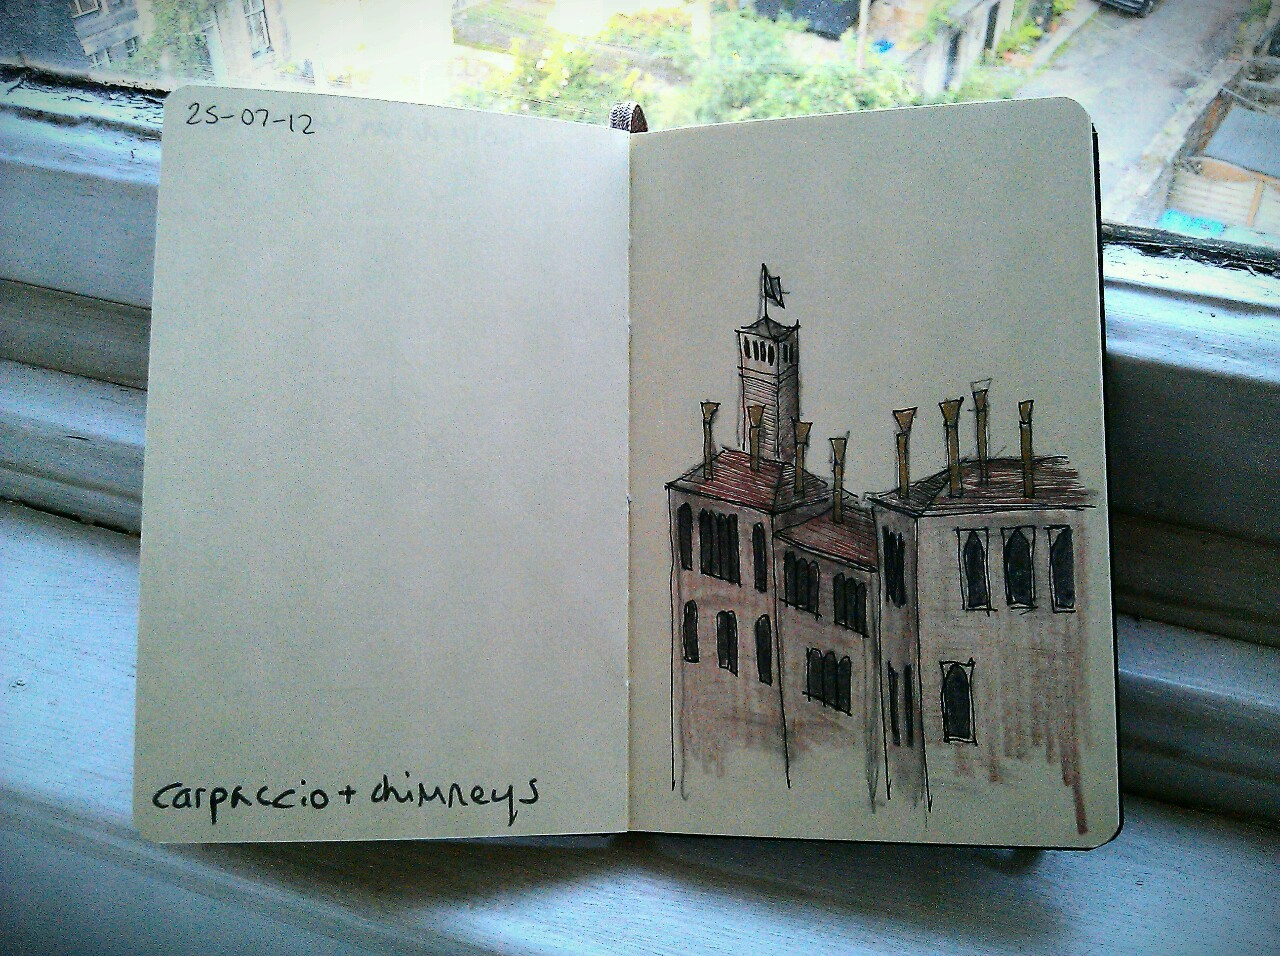 365 drawings later … day 176 … carpaccio + chimneys